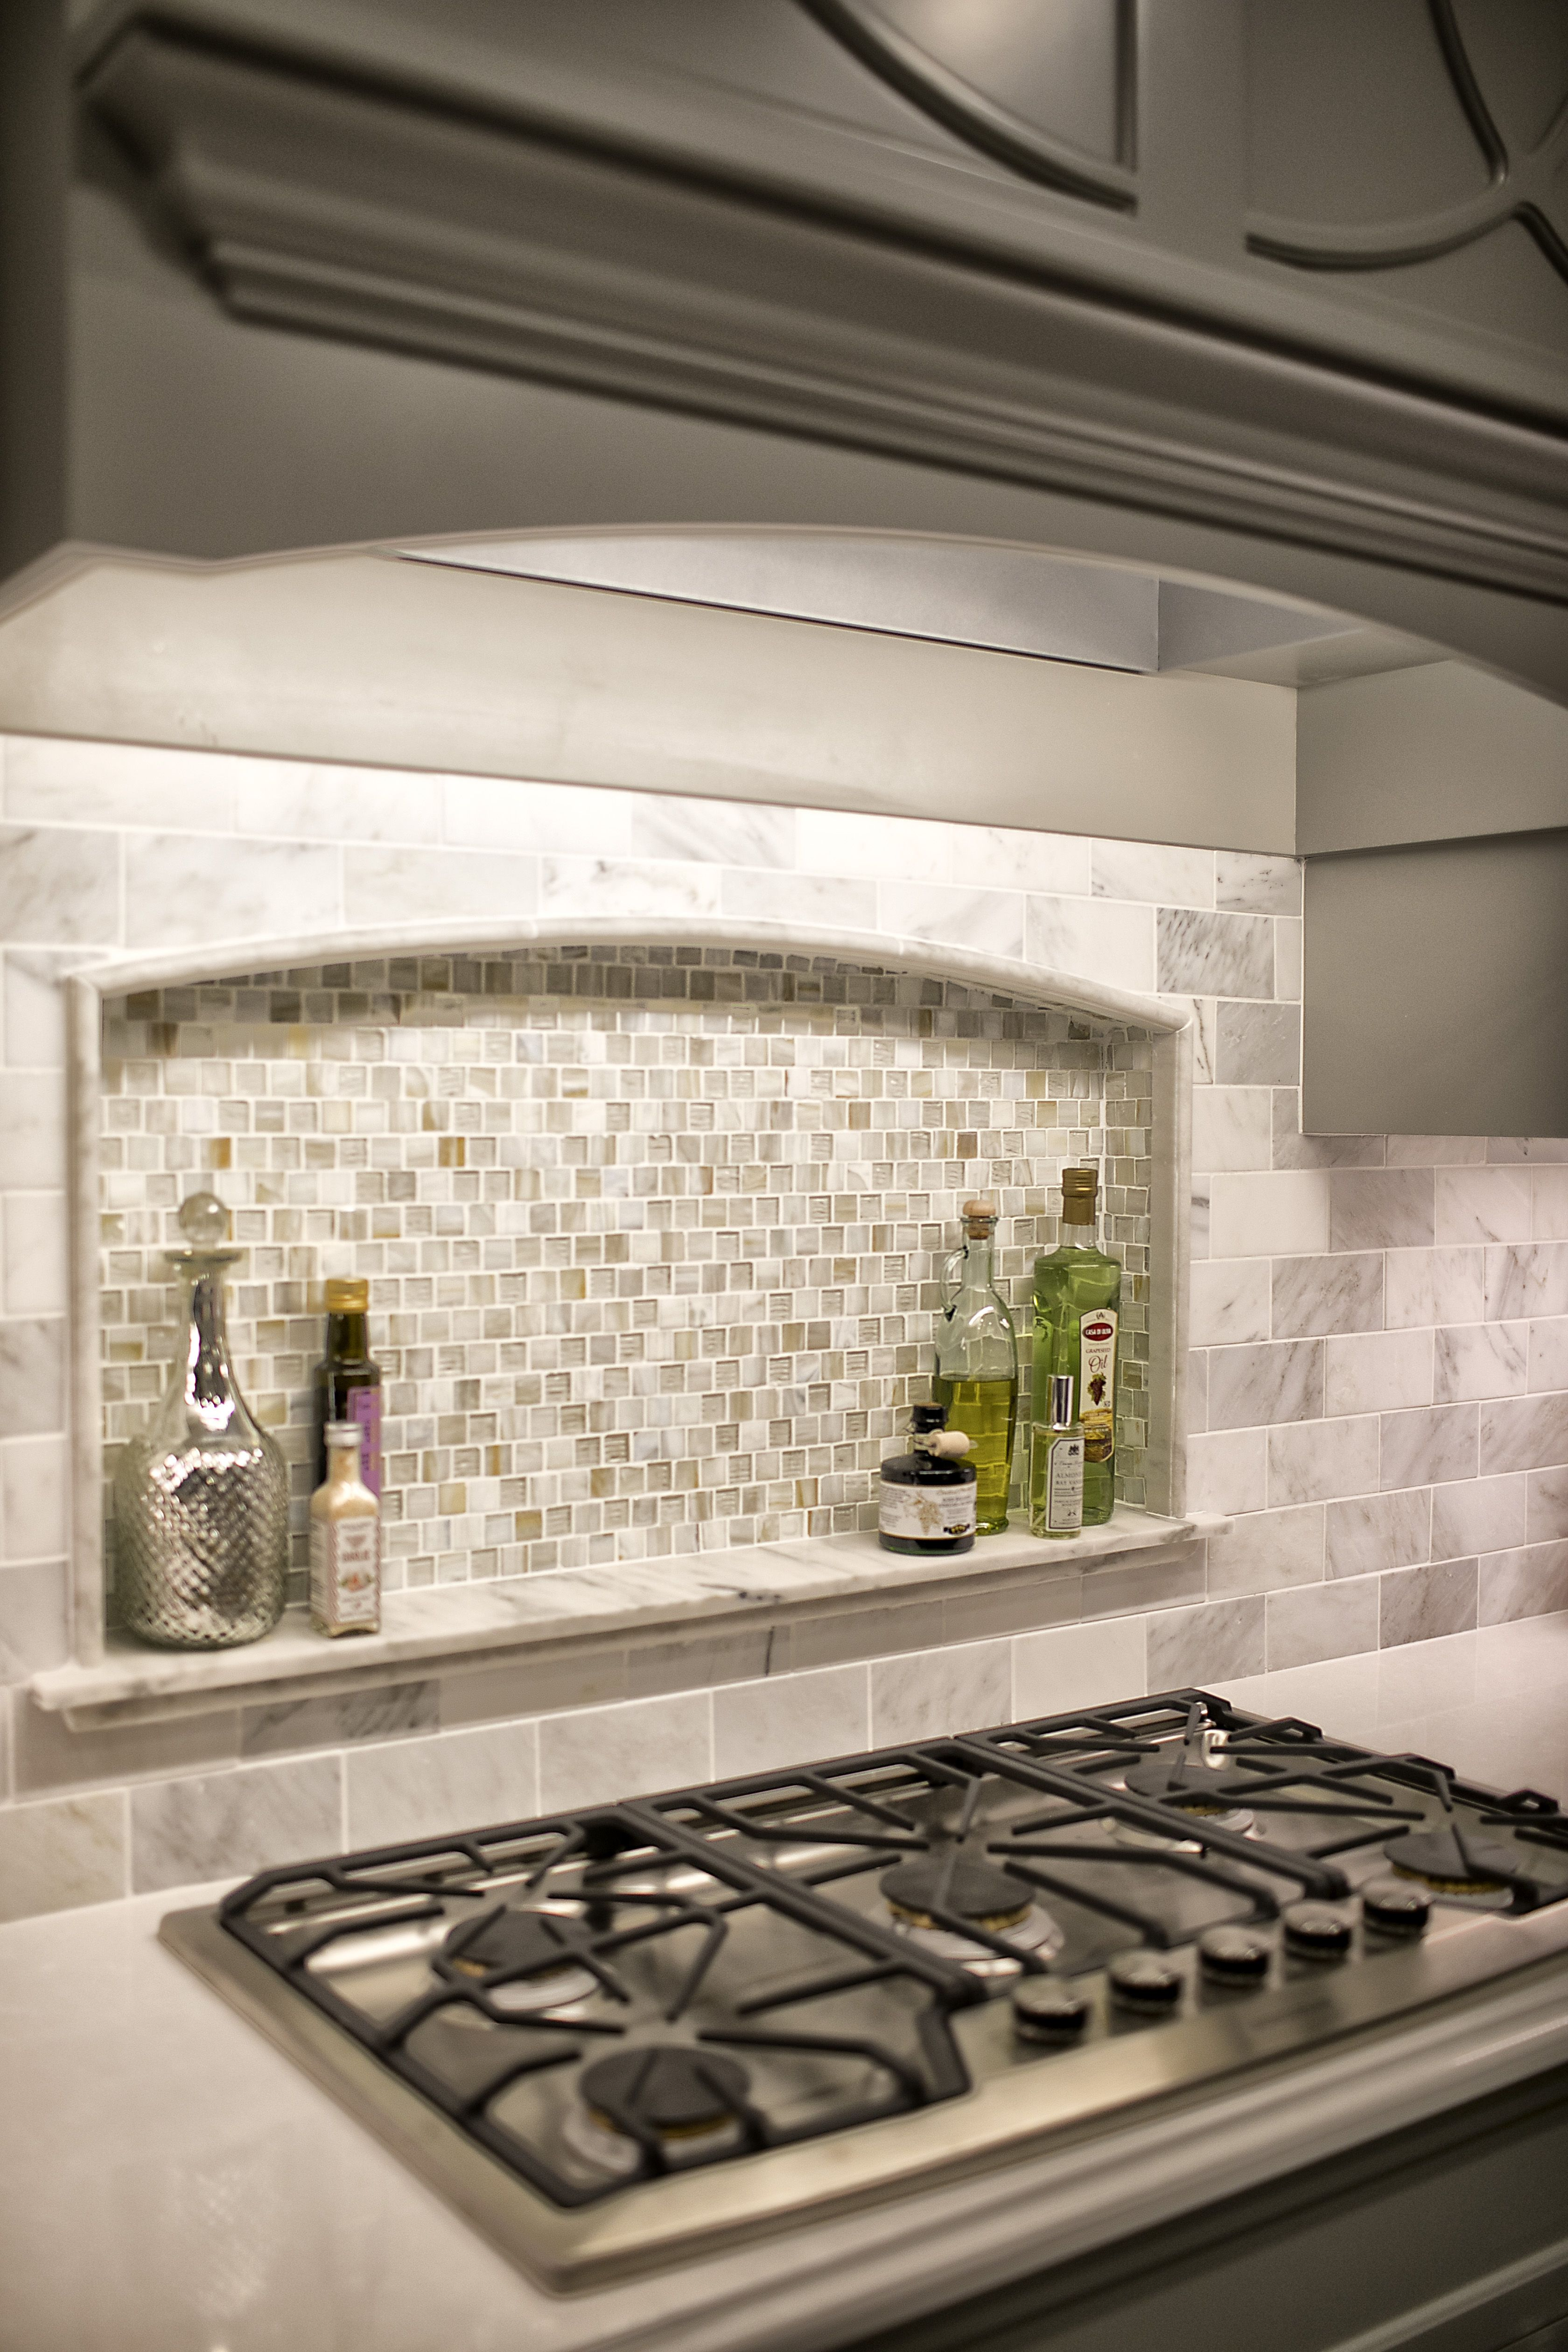 custom niche in kitchen backsplash with marble ledge. marble